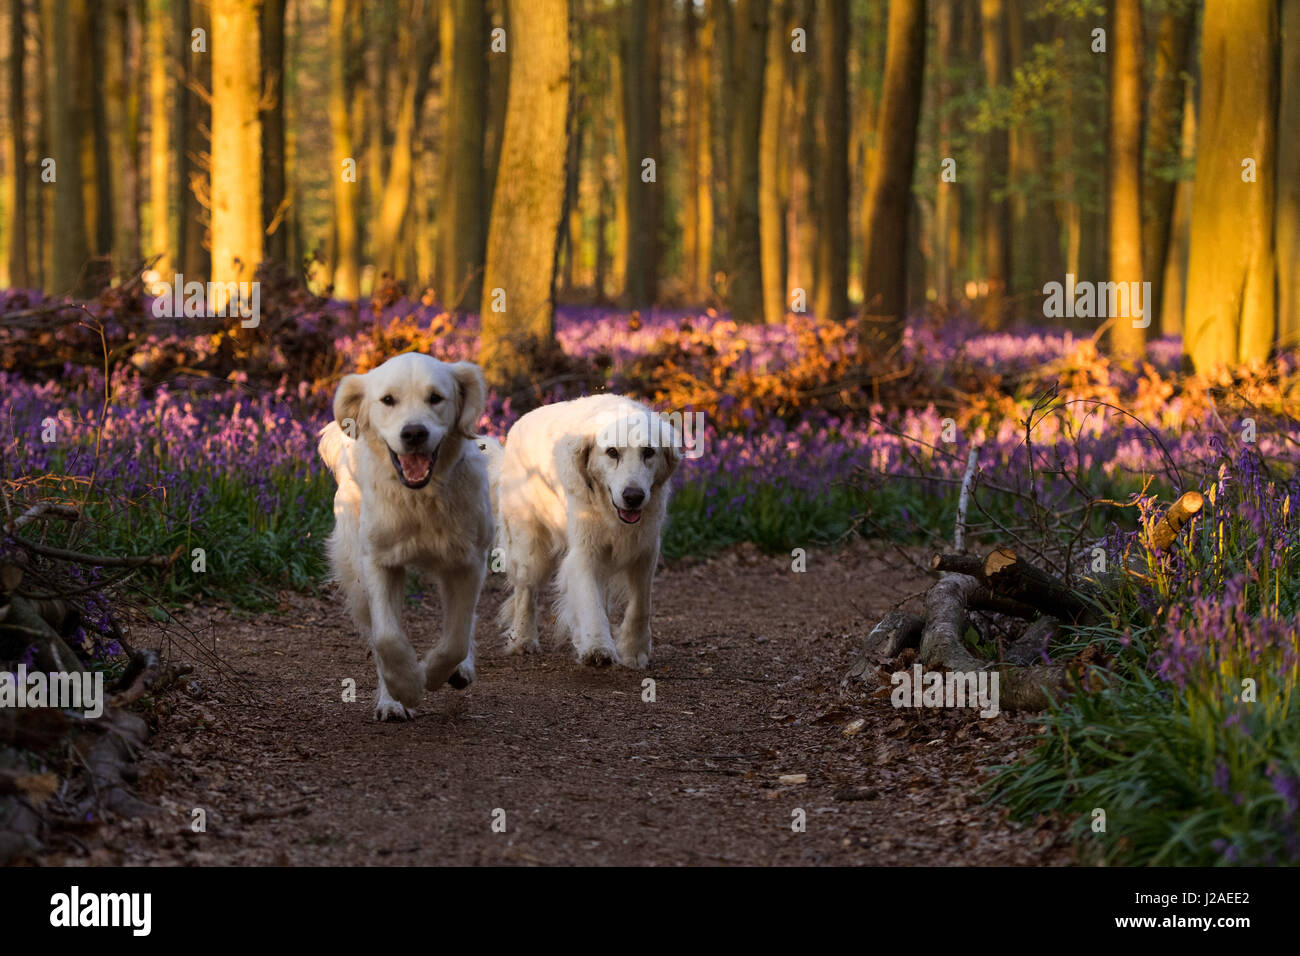 Two golden retrievers in the Dockey Wood bluebells at sunset - Ashridge Estate, Hertfordshire - Stock Image